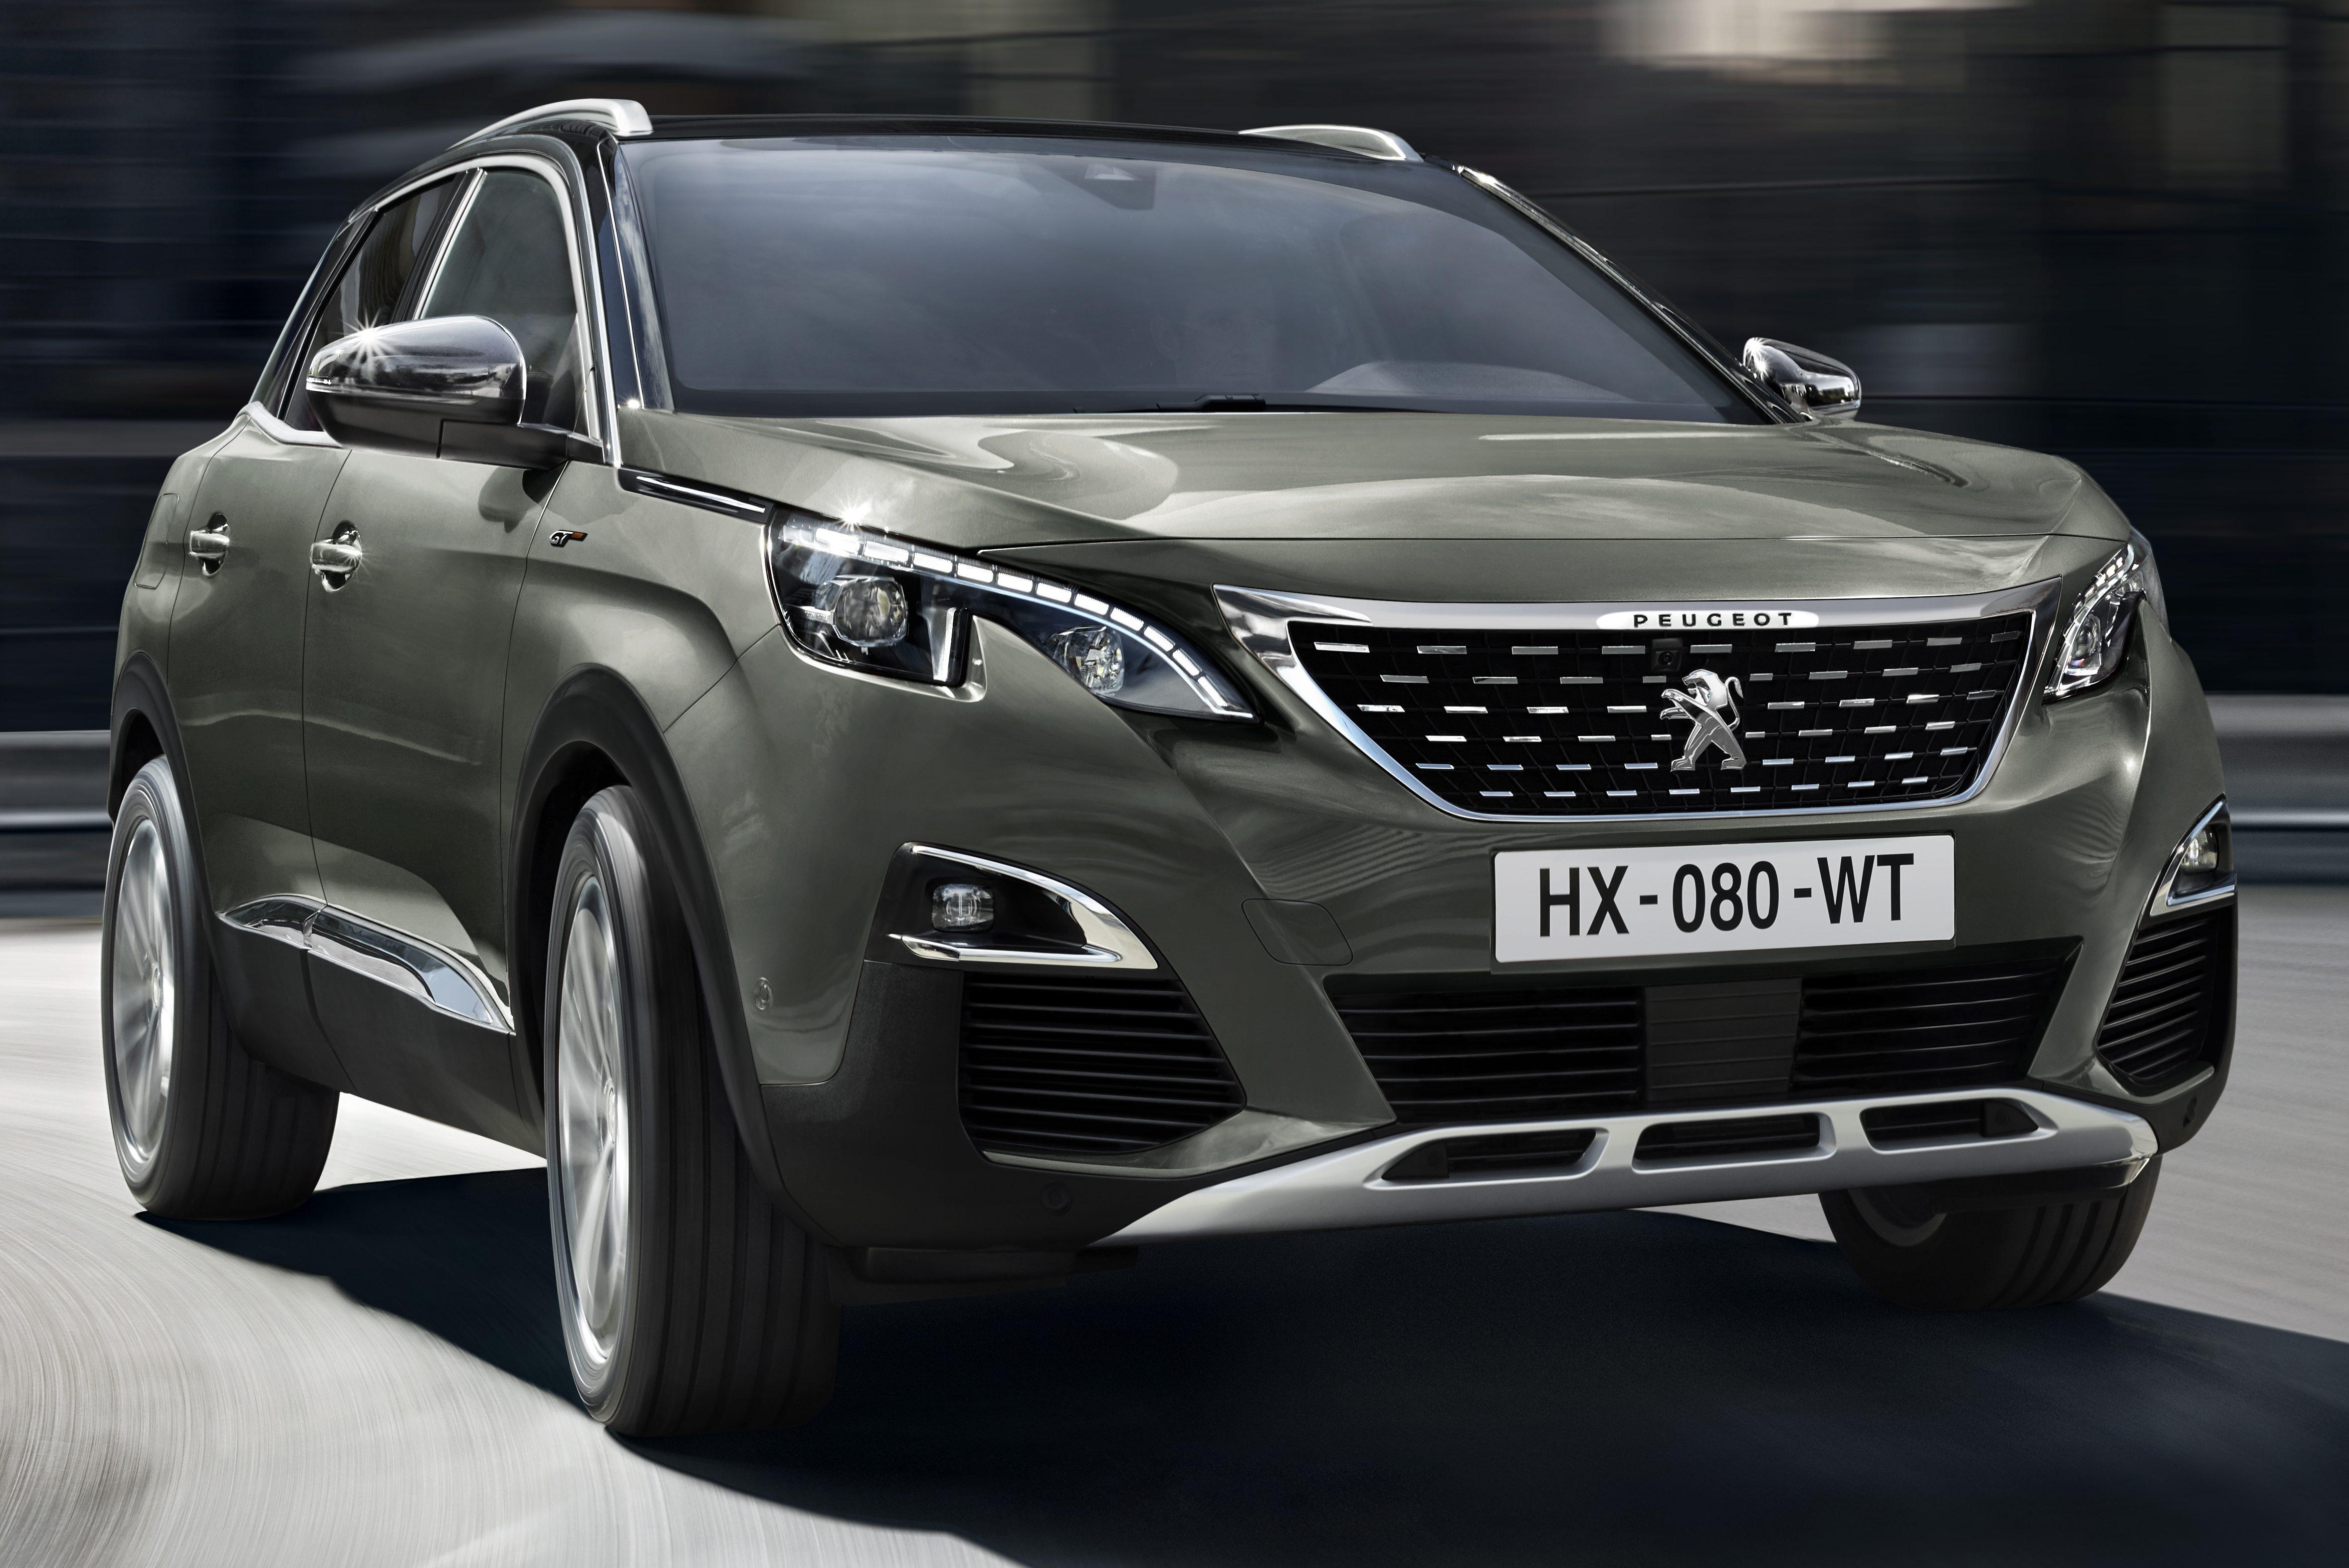 Peugeot Gt Unveiled Hp Diesel Warm Suv